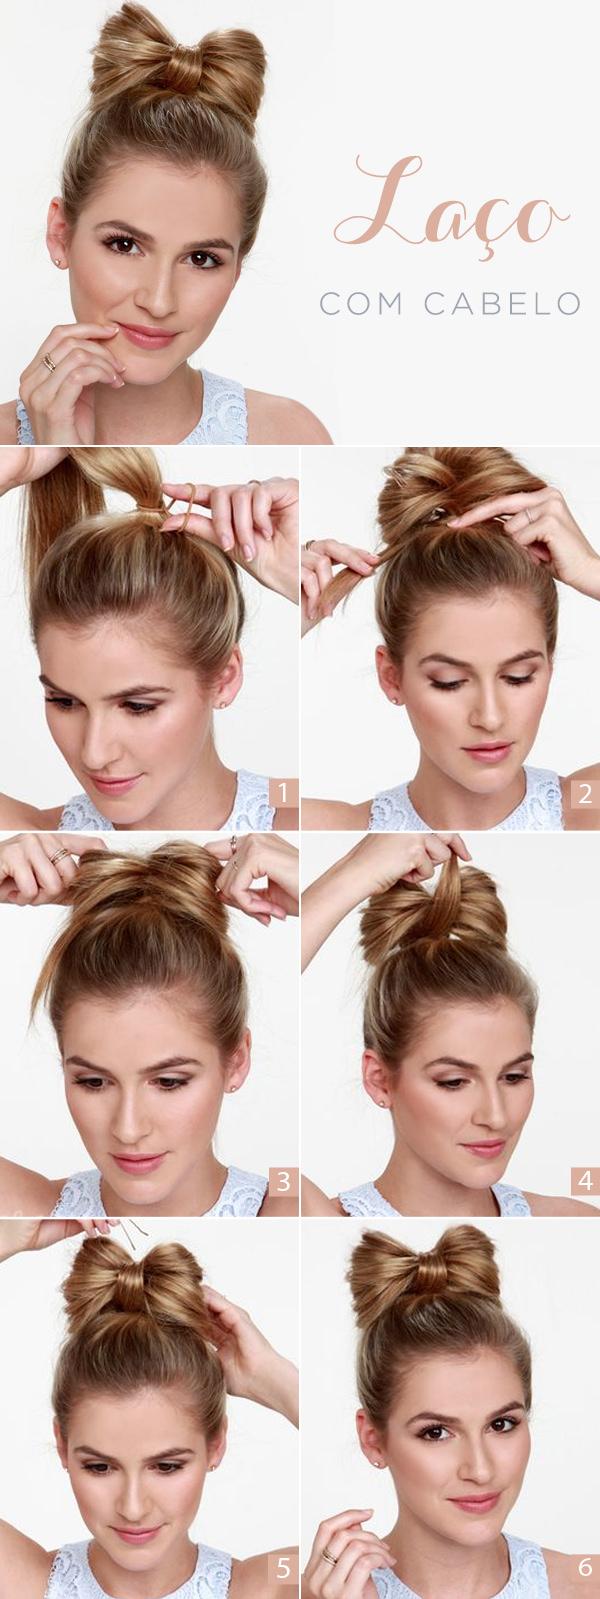 cz-festa-15-anos-tutorial-laco-de-cabelo